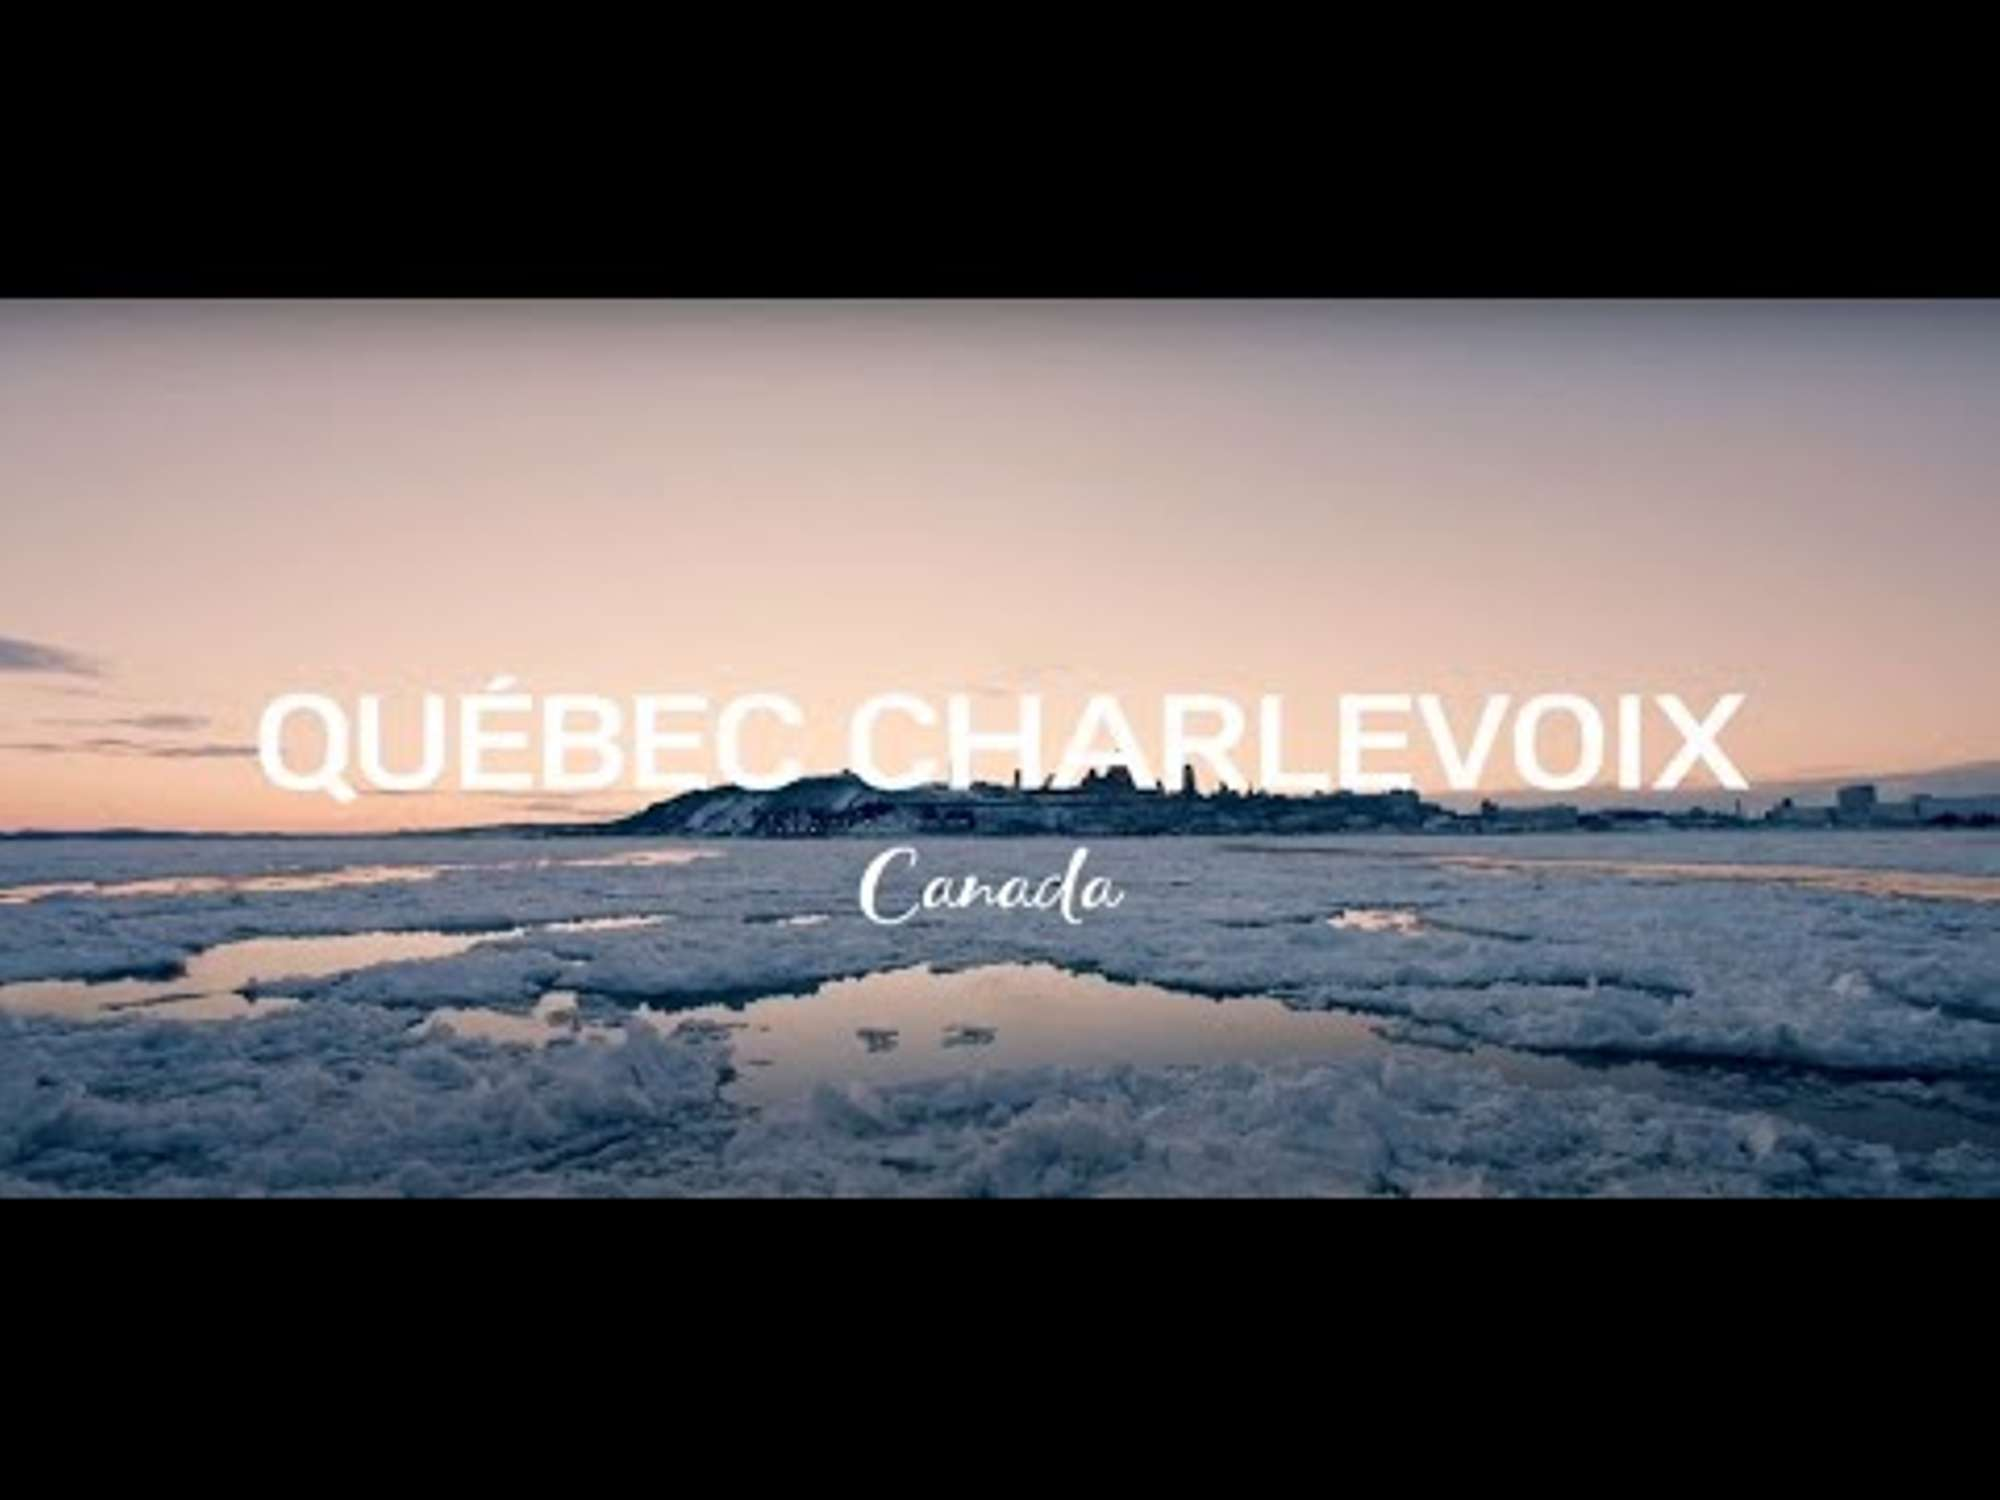 Open Quebec Charlevoix Vidéos slideshow gallery at 1